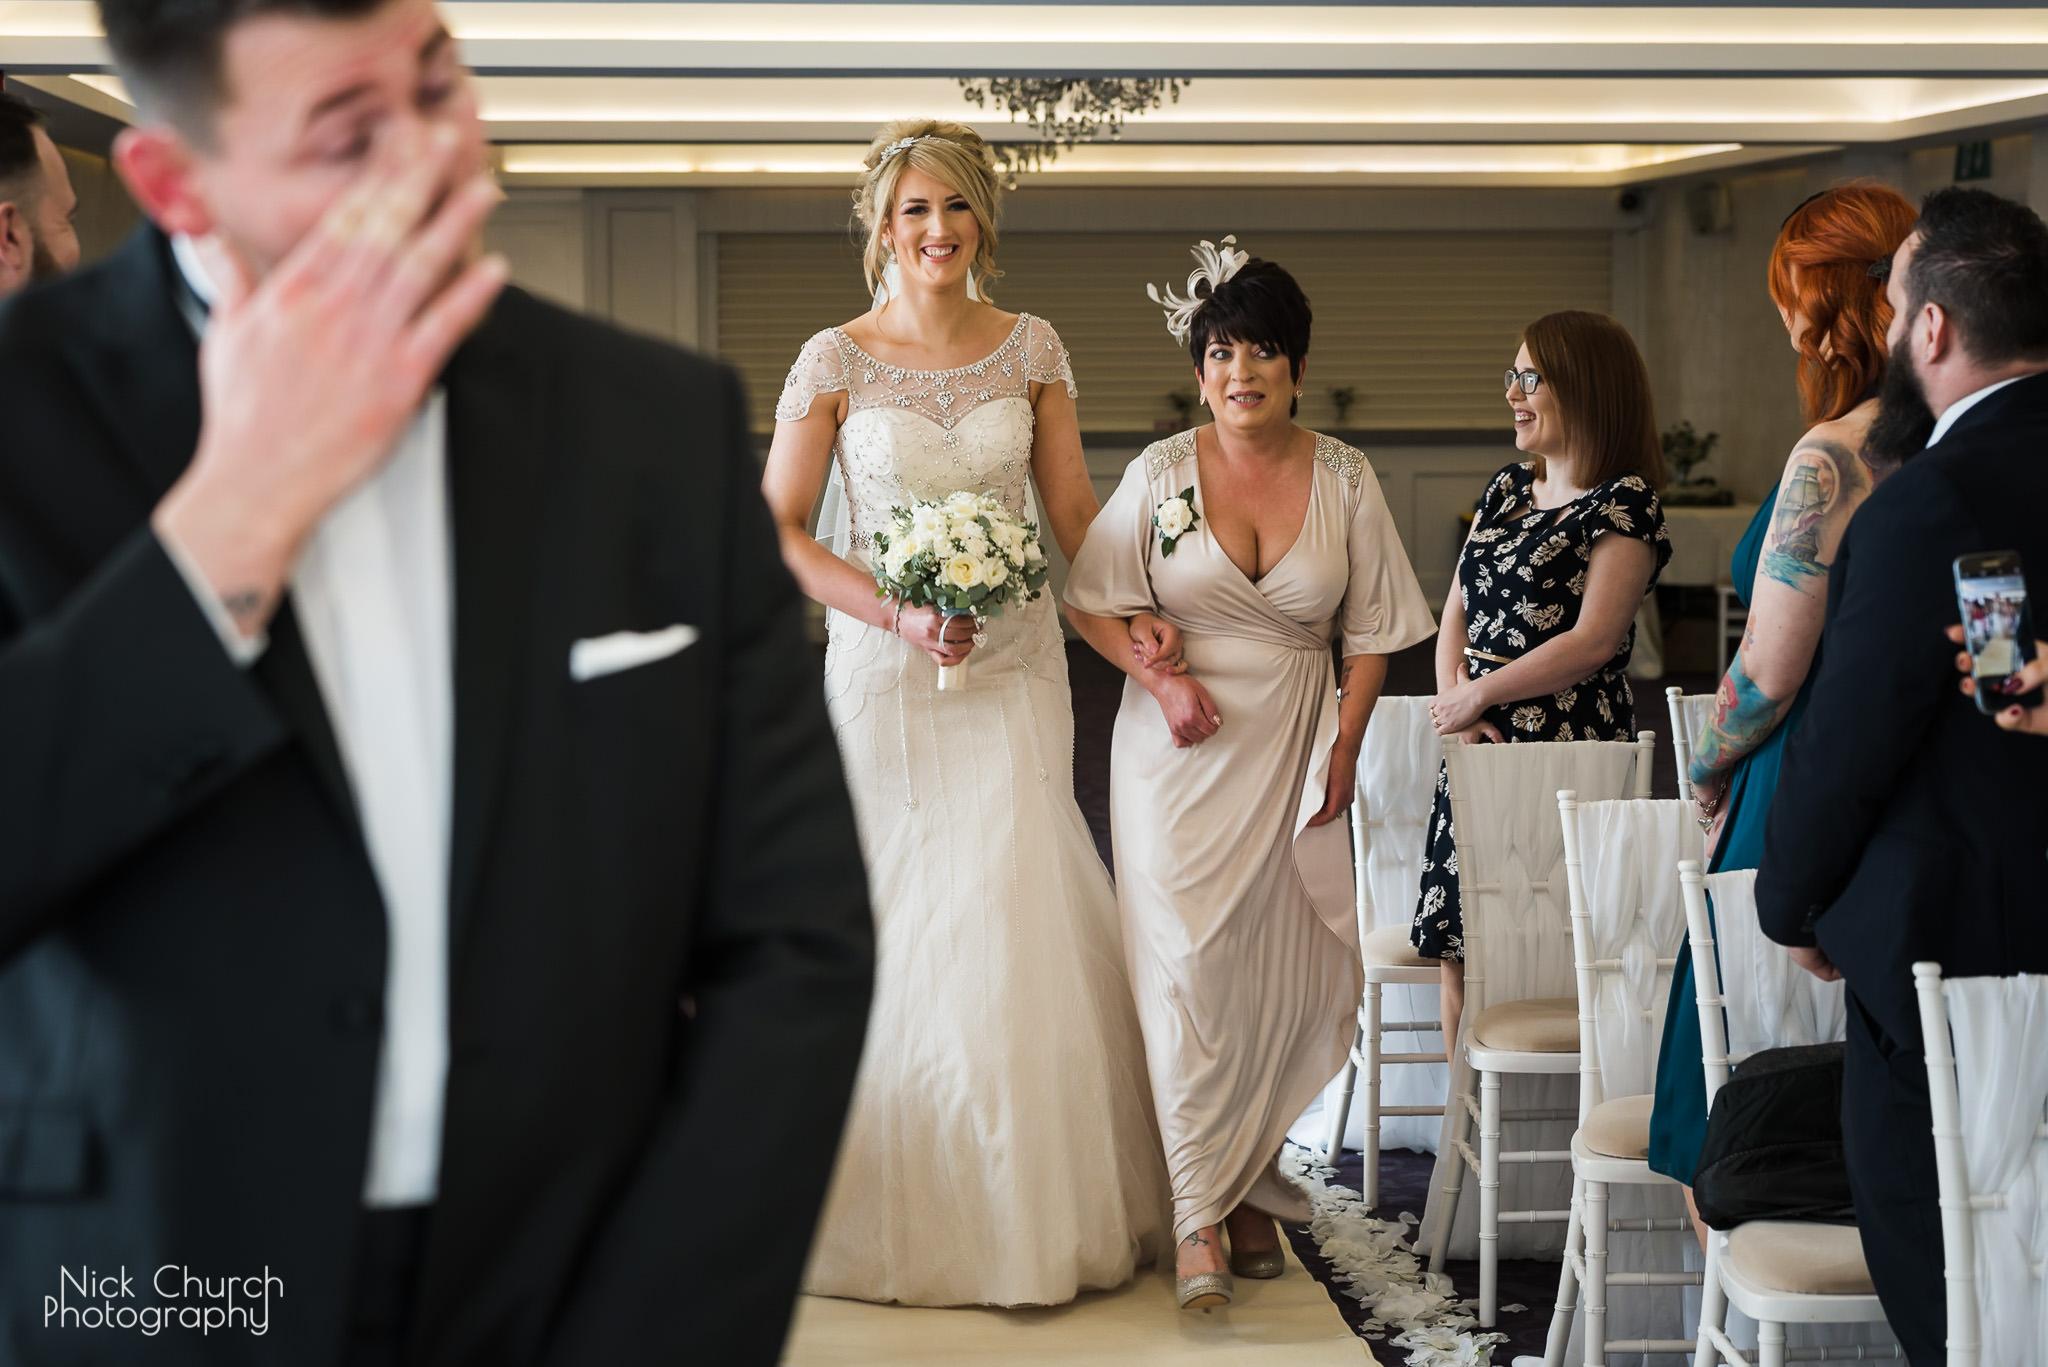 NC-20180317-stacy-and-mike-wedding-0414.jpg